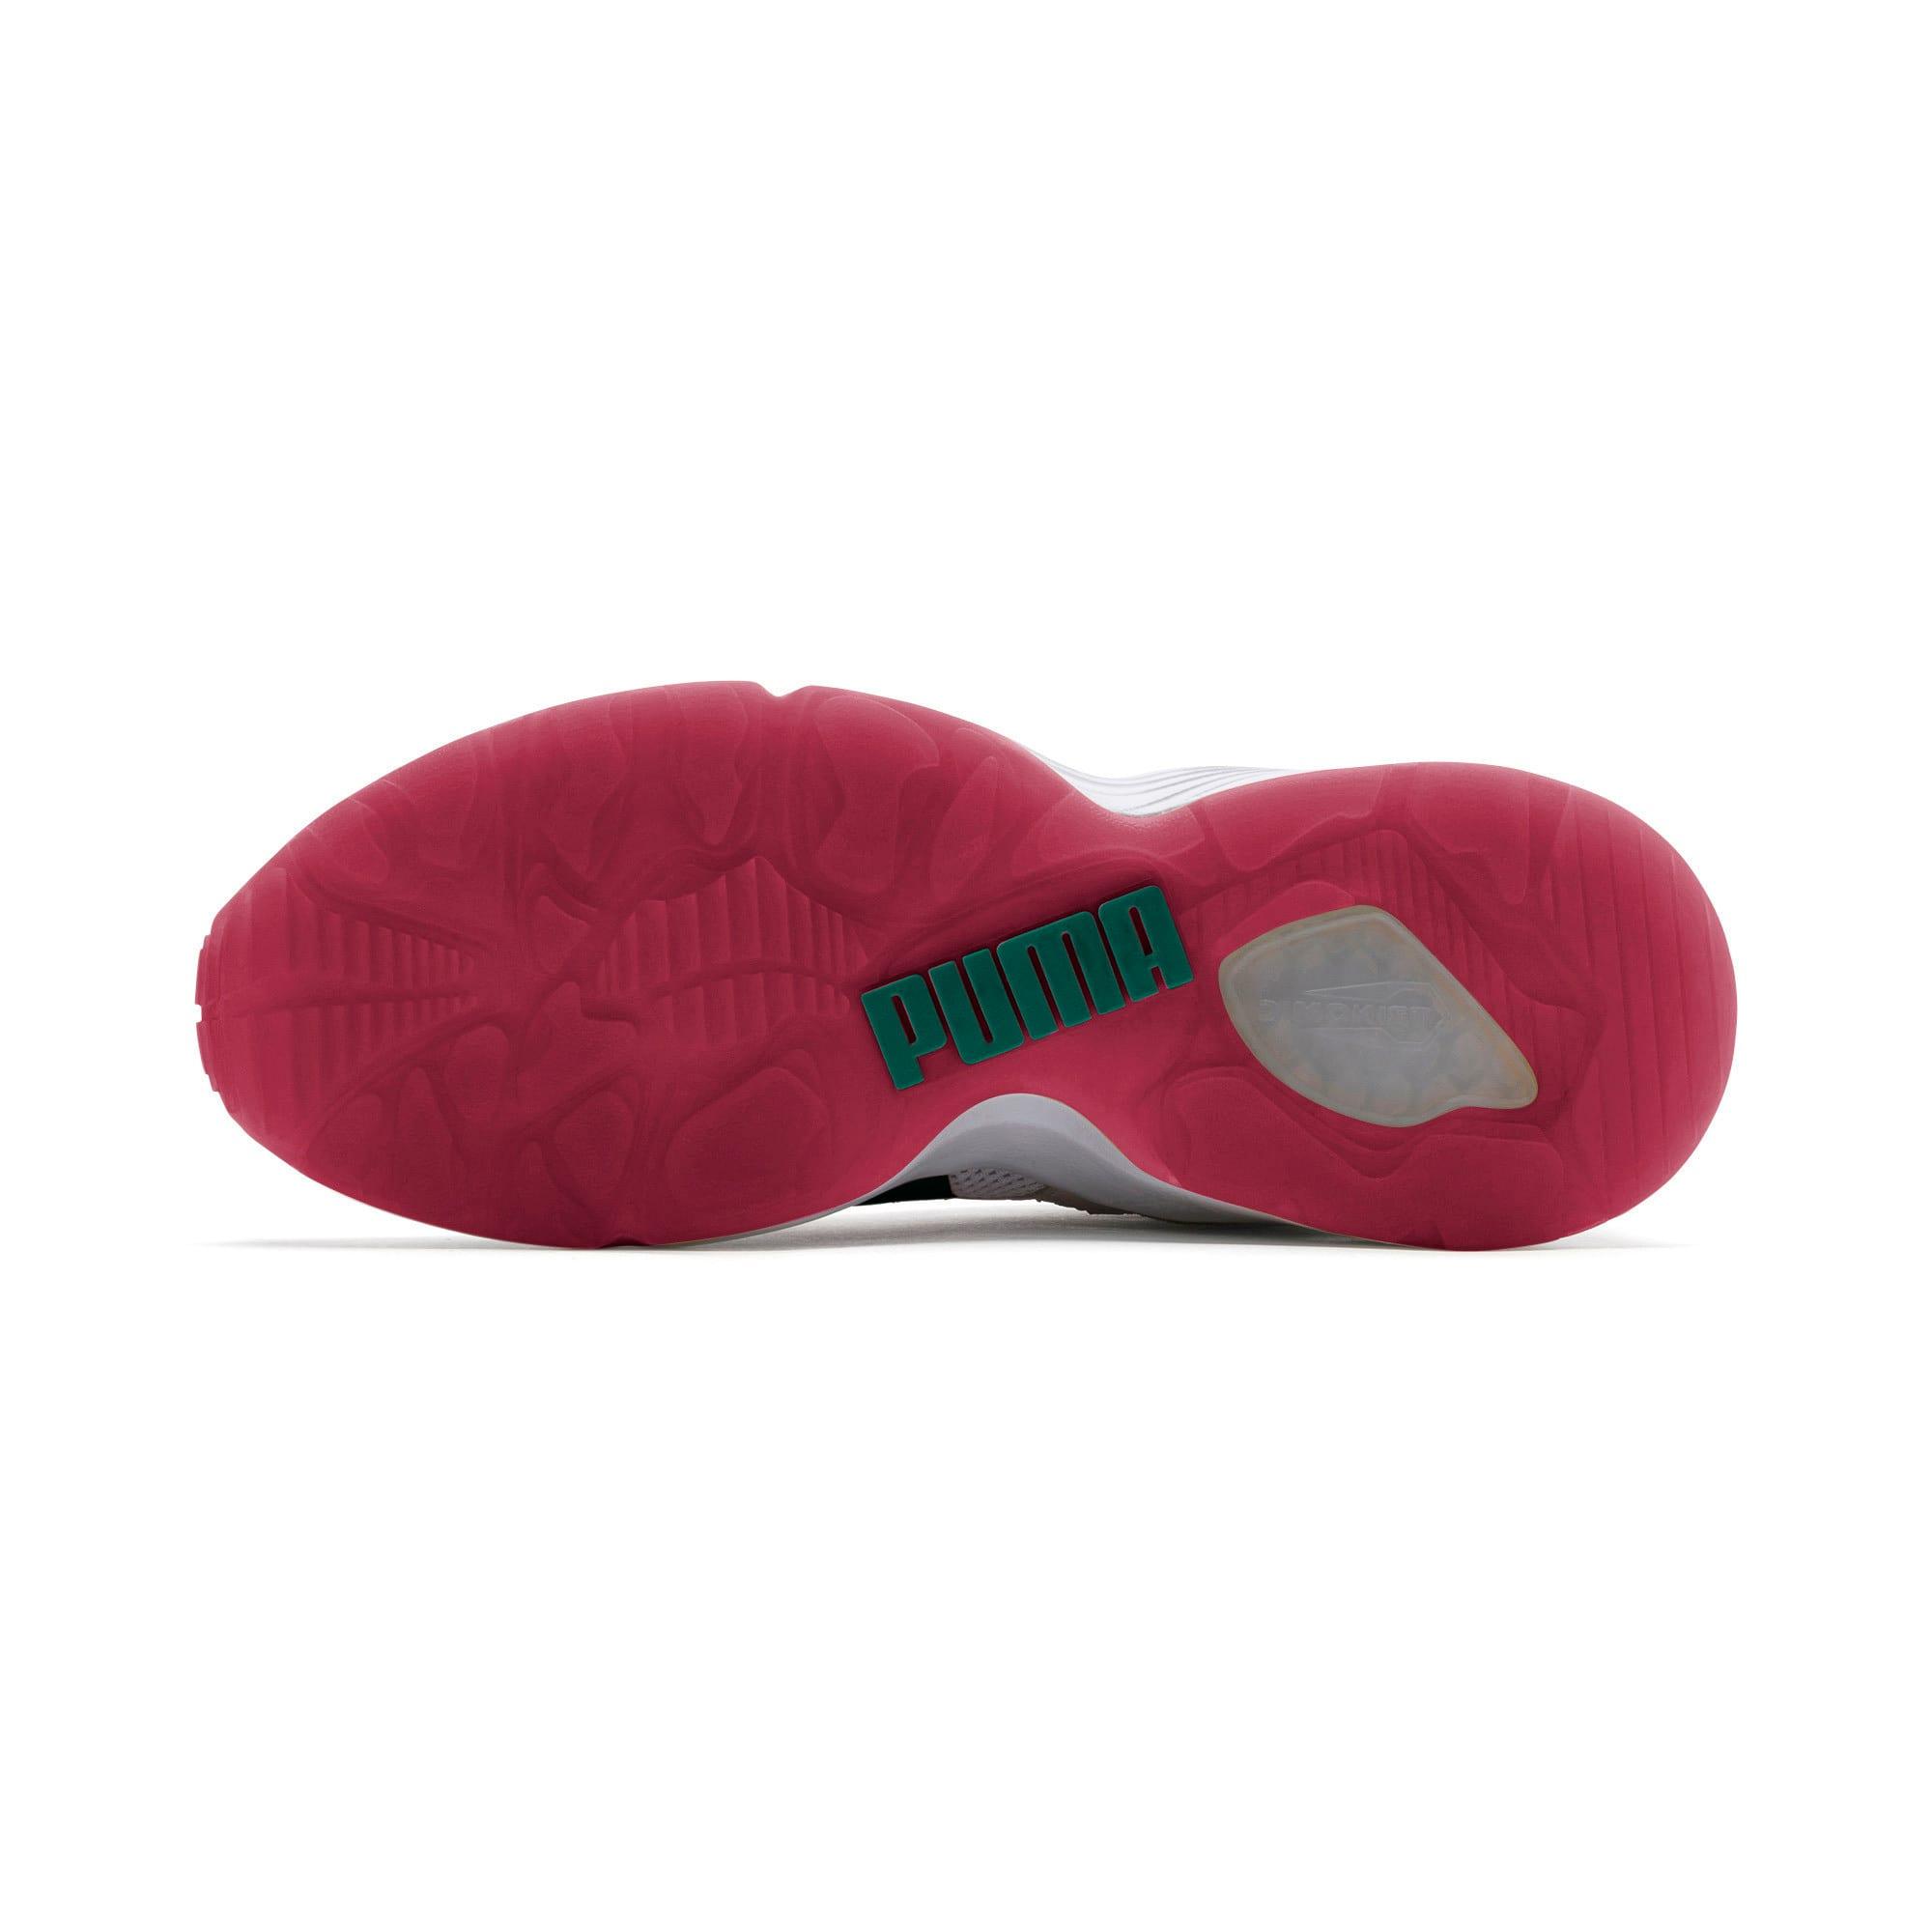 Thumbnail 4 of Prevail Classic Sneakers, Puma White-Teal Green, medium